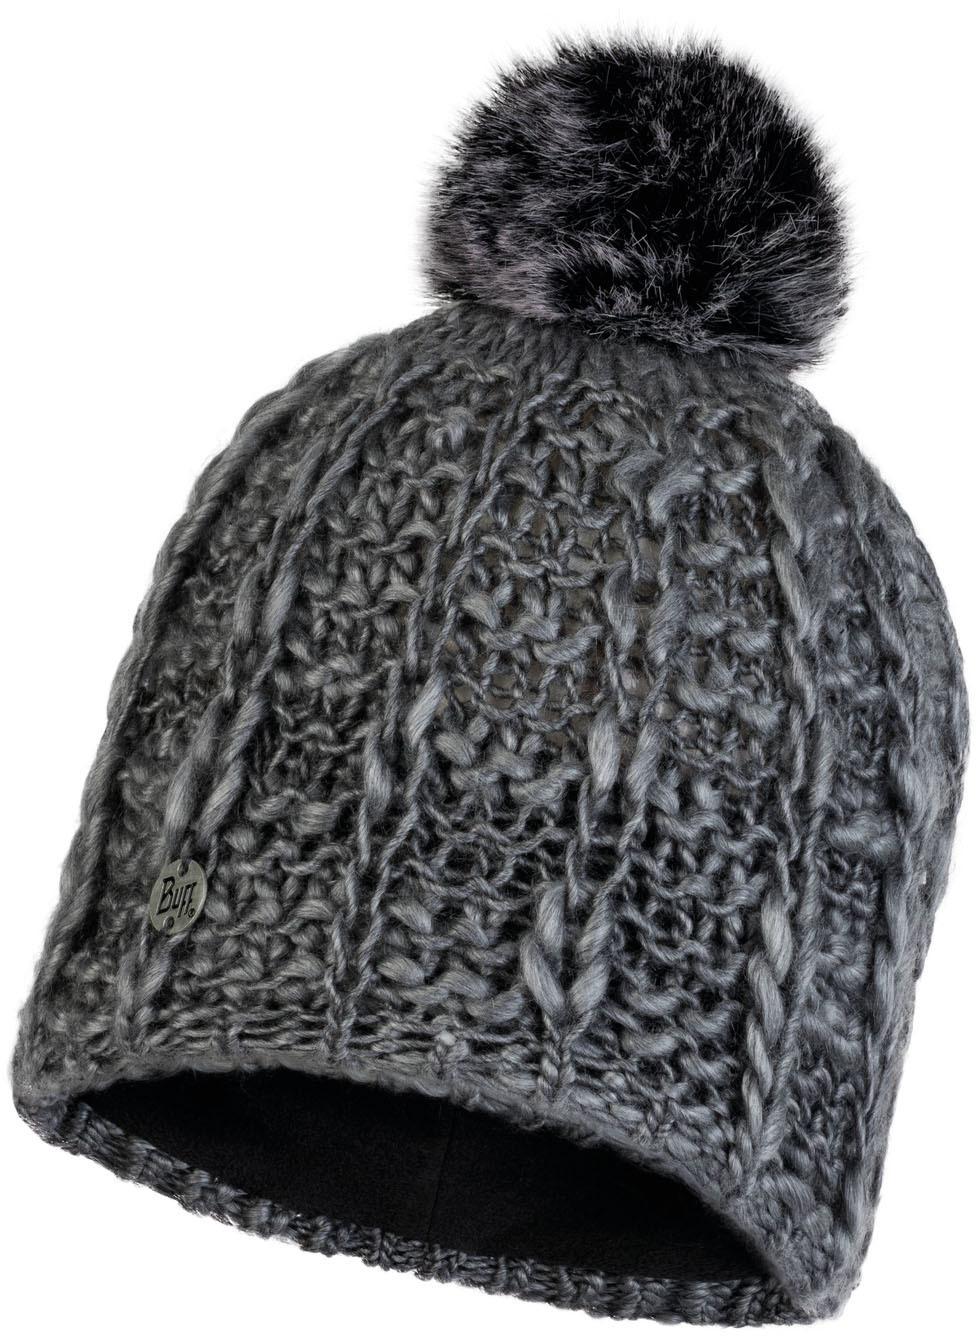 Шапки с помпоном Шапка вязаная с флисом Buff Hat Knitted Polar Liv Pebble Grey 120706.301.10.00.jpg